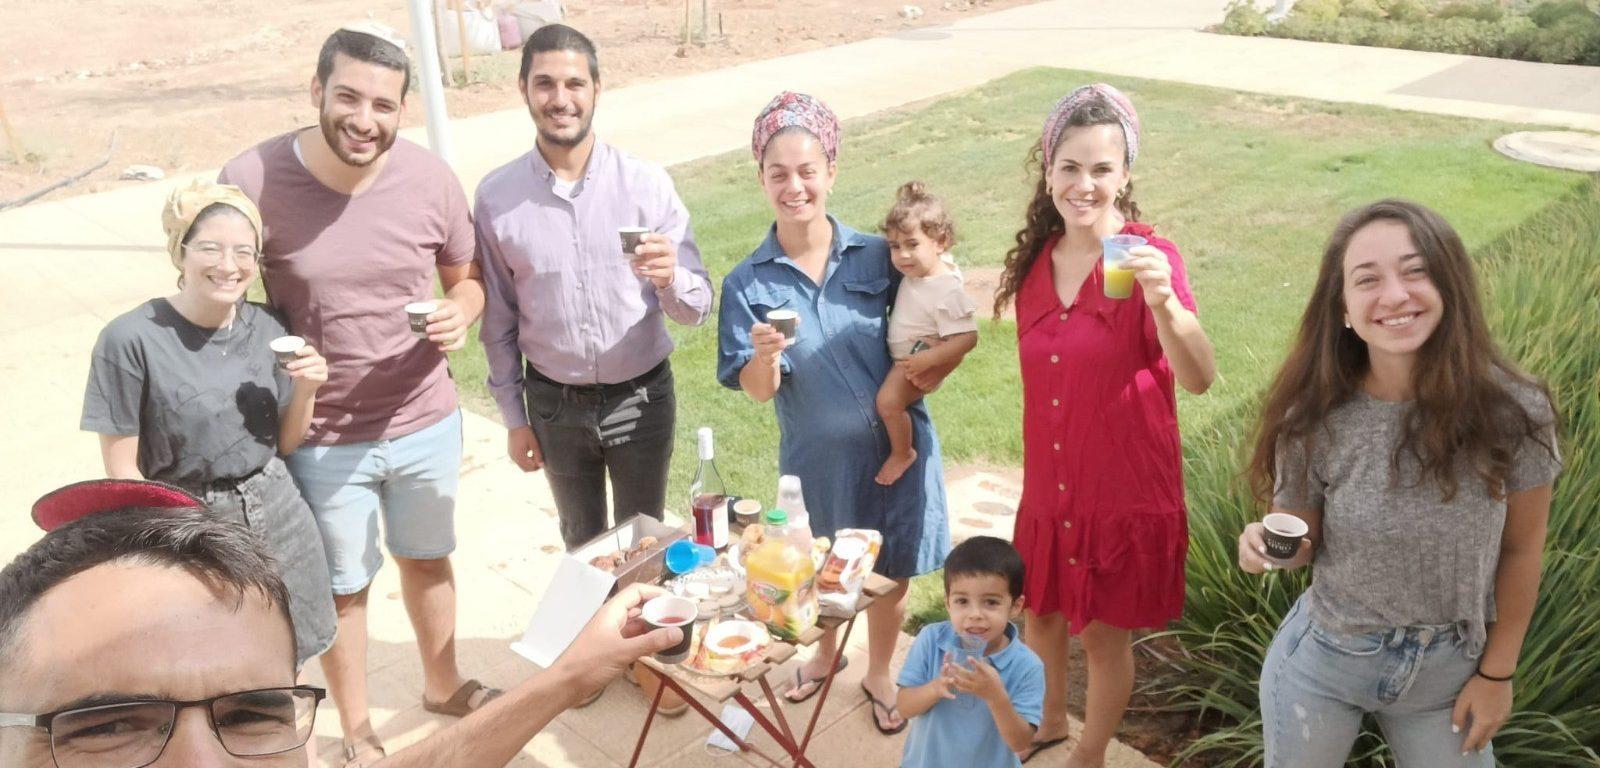 Students on the patio outside their apartment at ADI Negev Nahalat Eran סטודנטים במרפסת מחוץ לדירתם בעדי נגב נחלת ערן